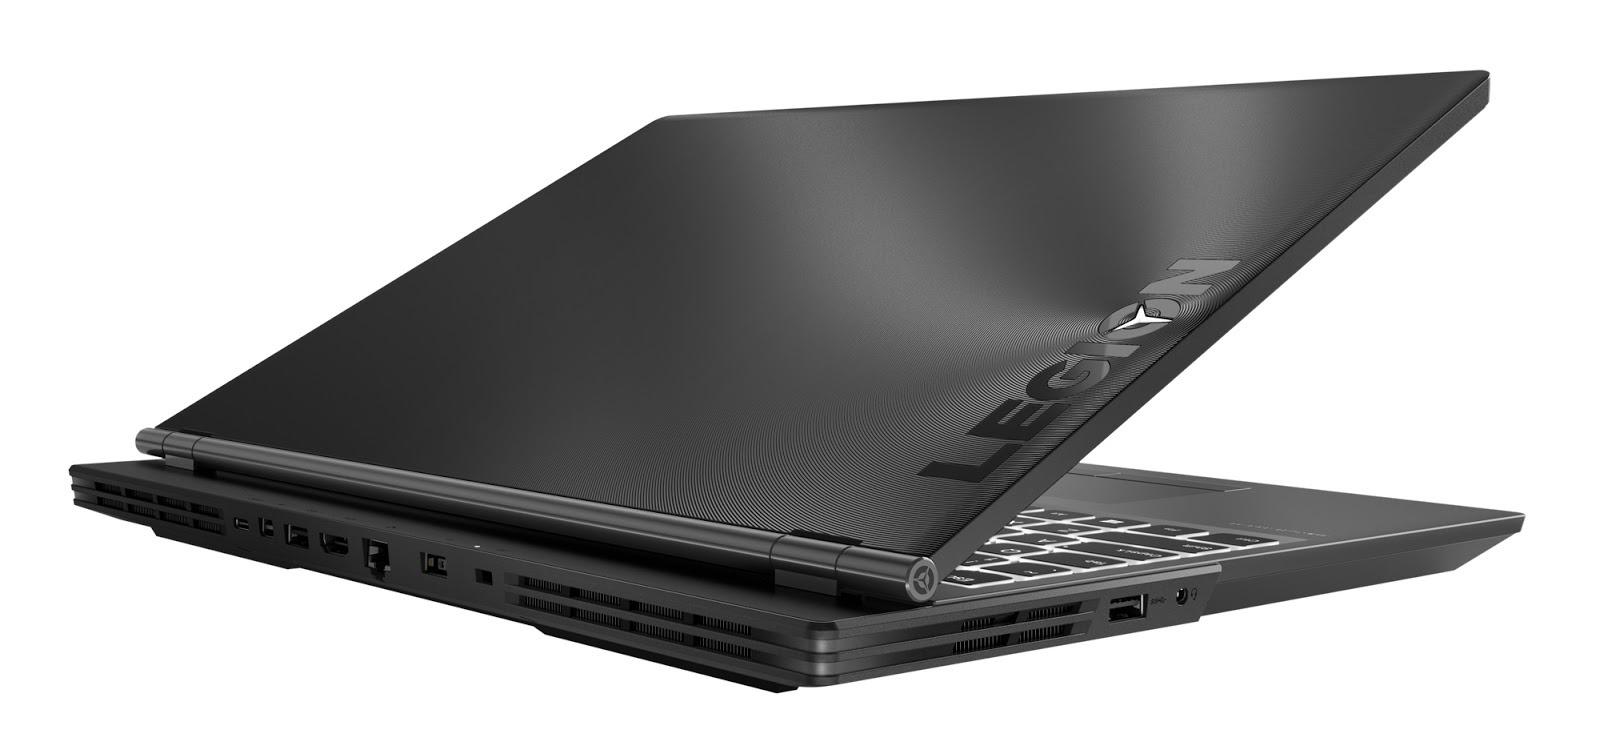 Фото 4. Ноутбук Lenovo Legion Y540-15IRH Black (81SX012DRE)